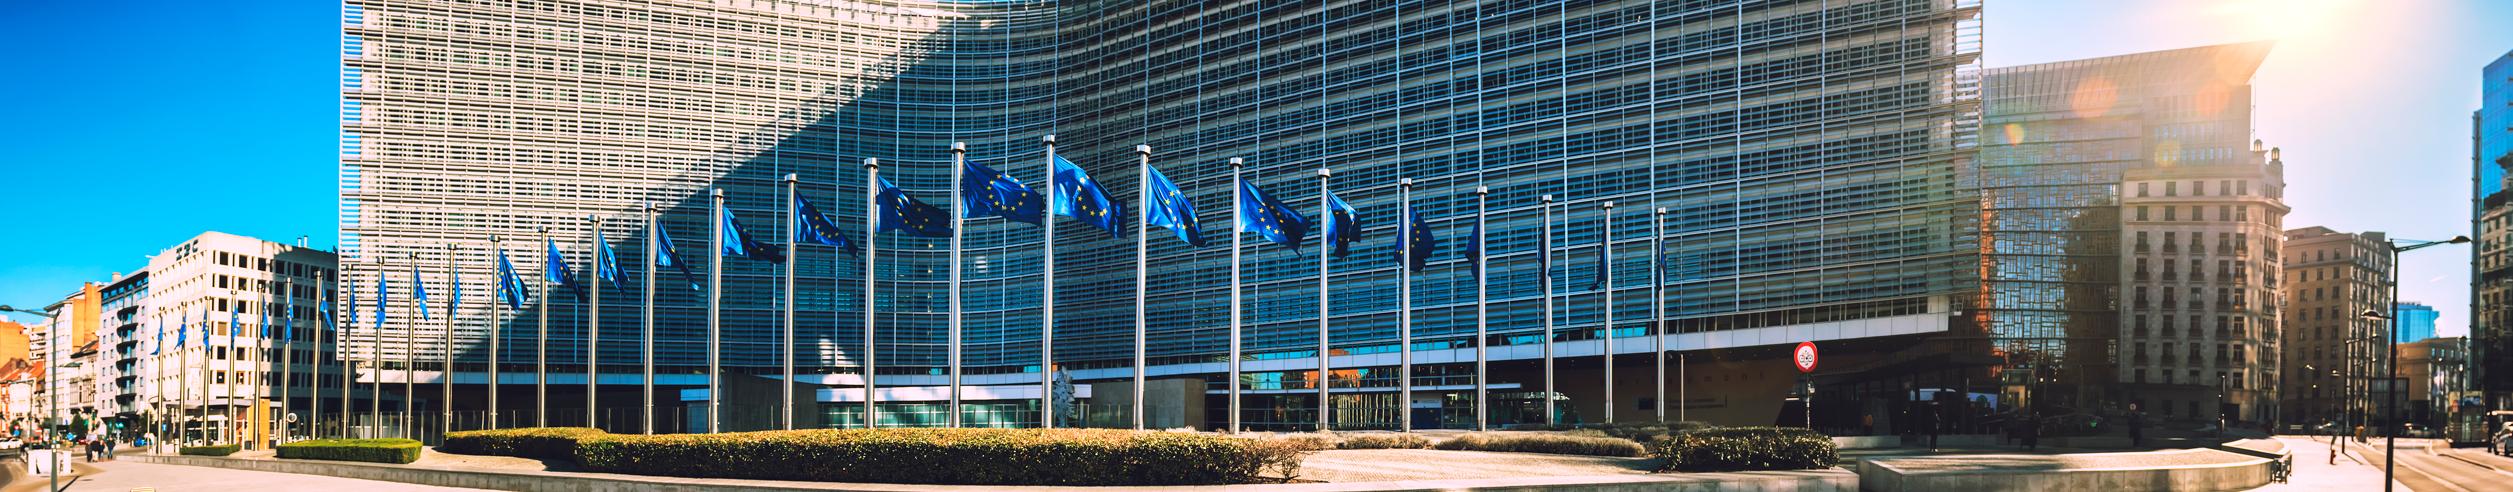 The U.A.E. - Brussels, Belgium - Berlaymont building